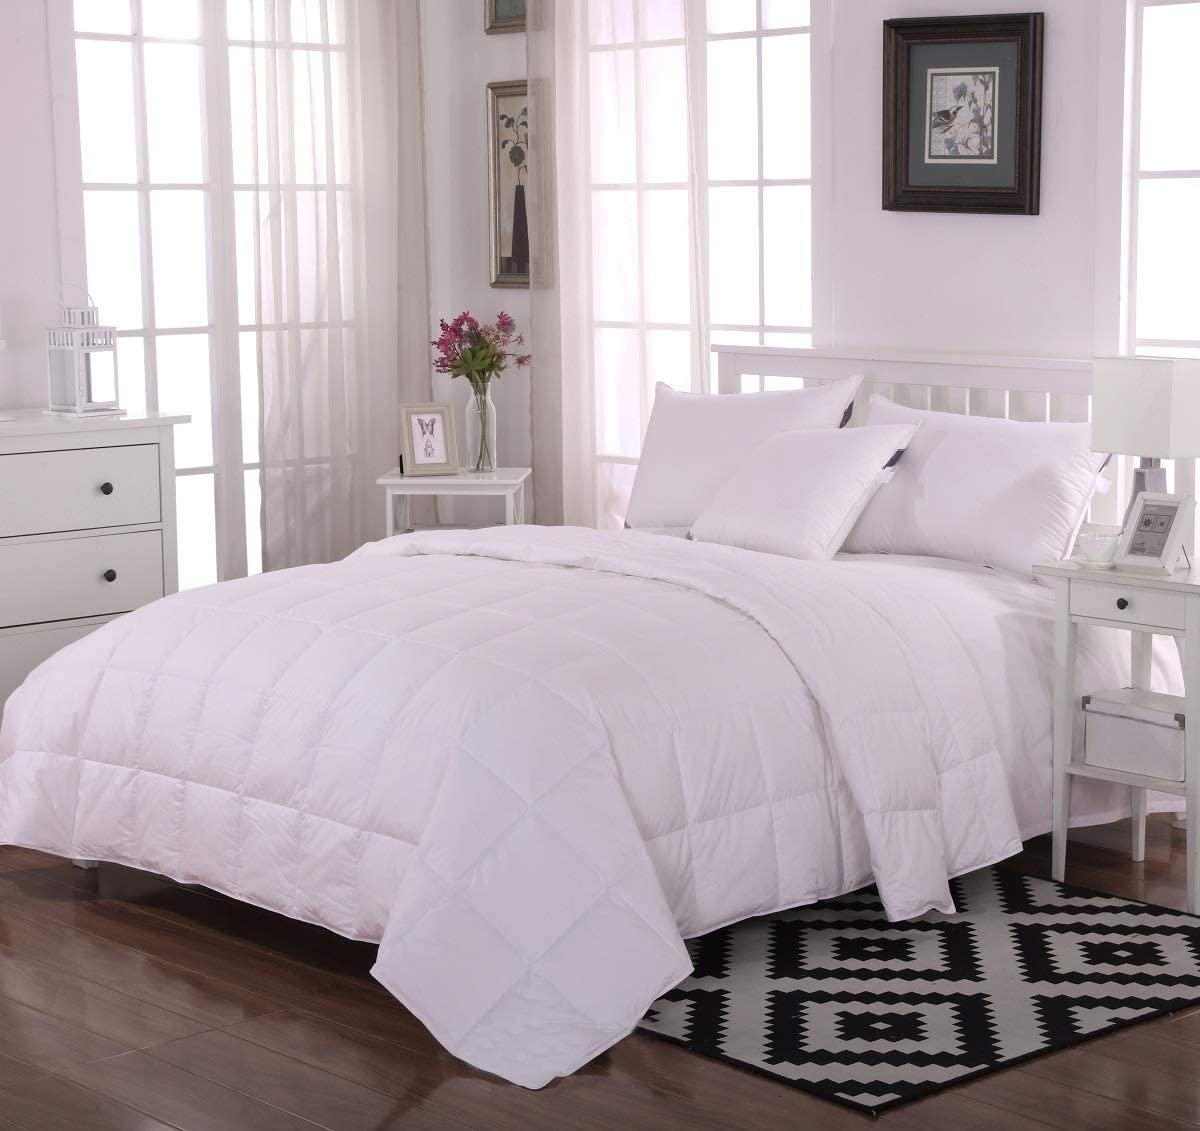 Eastwarmth Goose Down Comforter Queen Size 100% Organic Cotton Shell, Lightweight Duvet/Blanket 650+Filling Power White